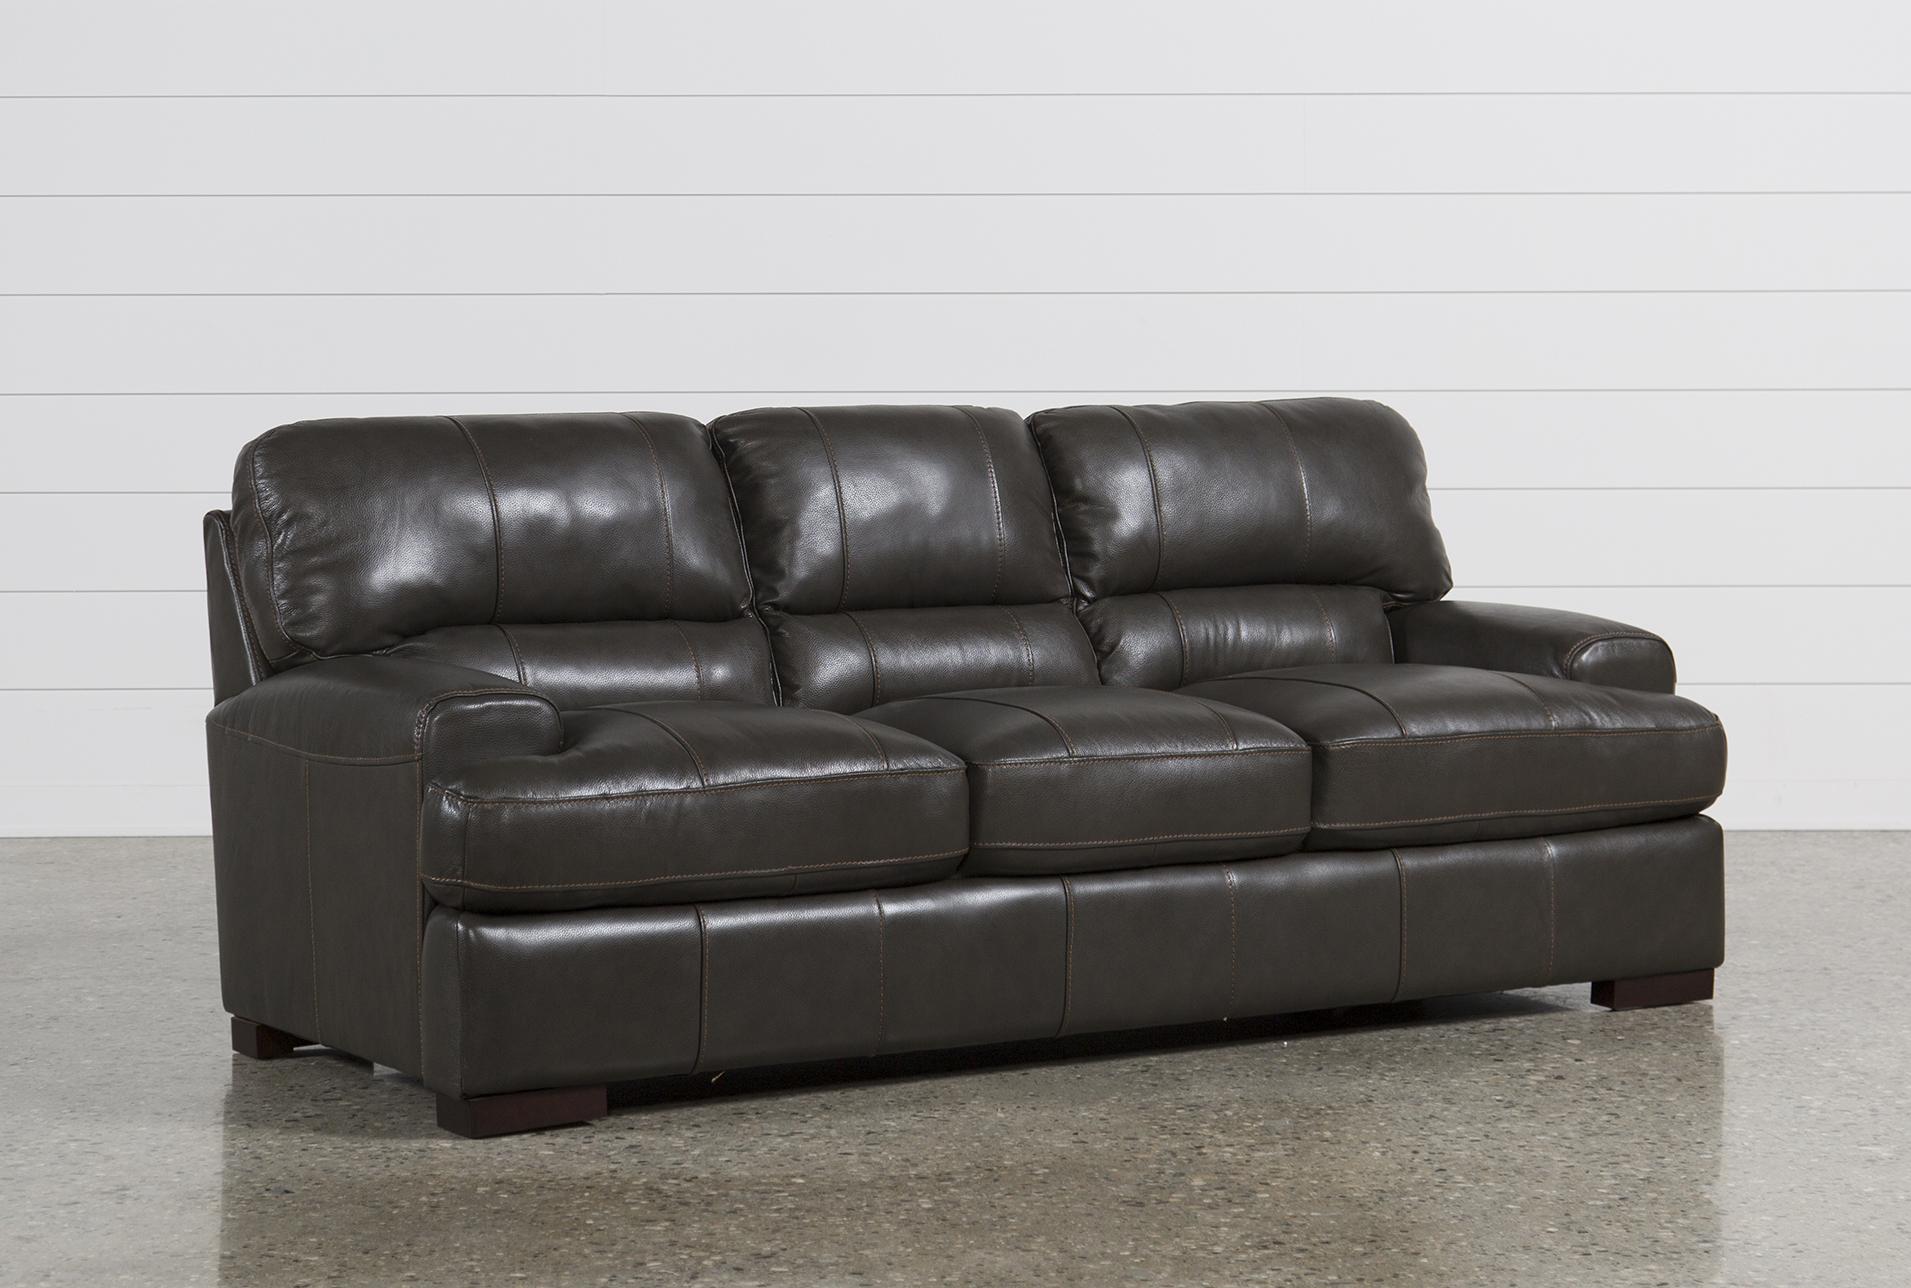 Merveilleux Andrew Leather Sofa   360